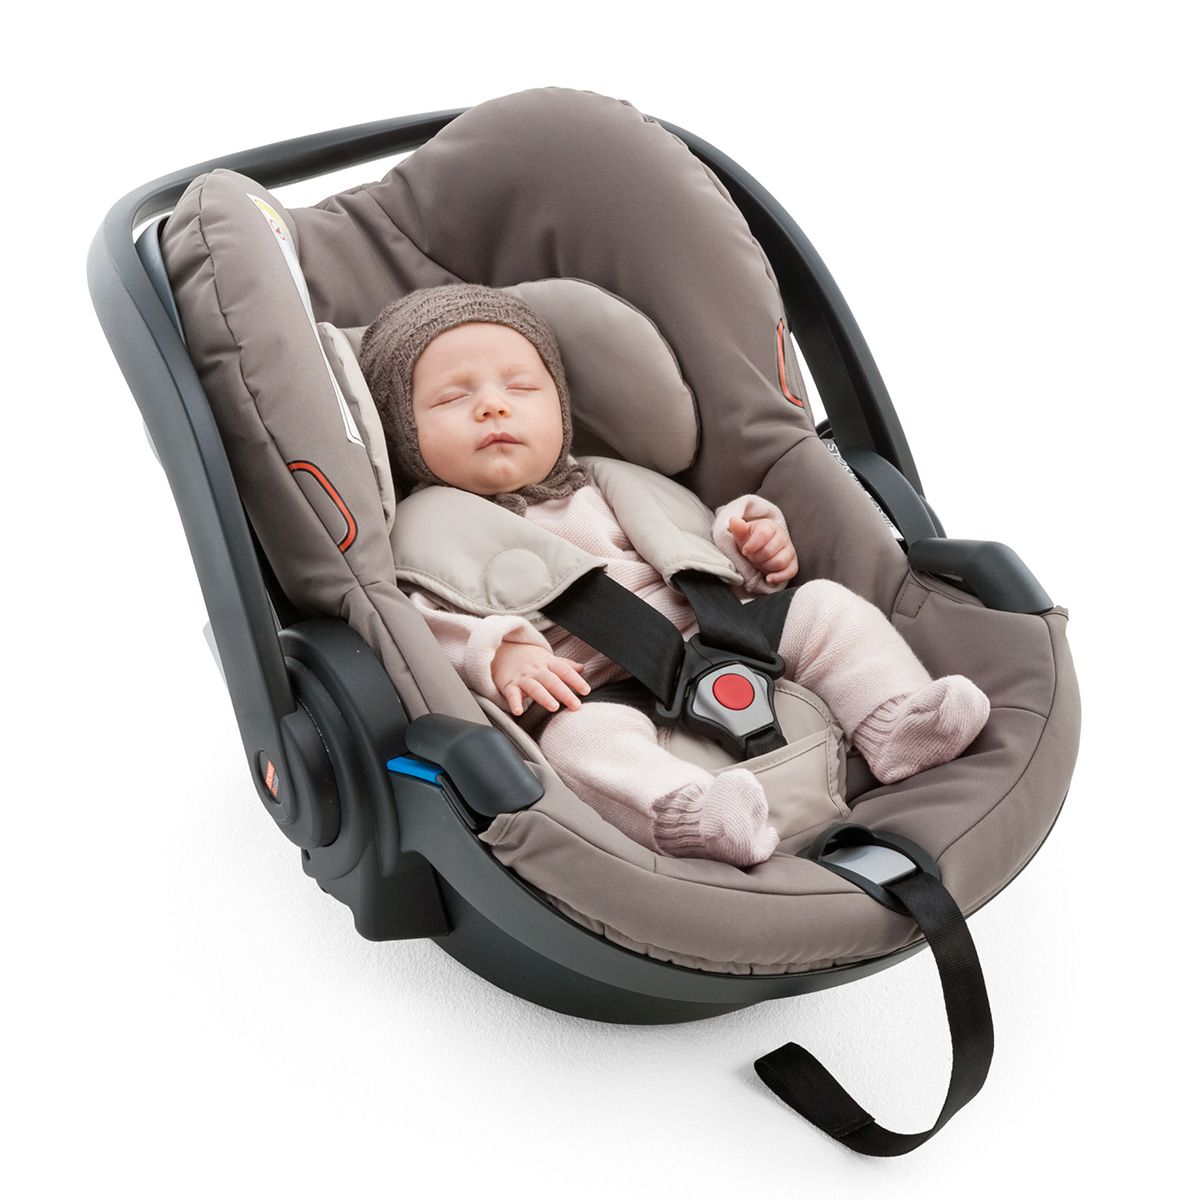 Product Information Stokke United Kingdom Car Seats Baby Car Seats Stokke